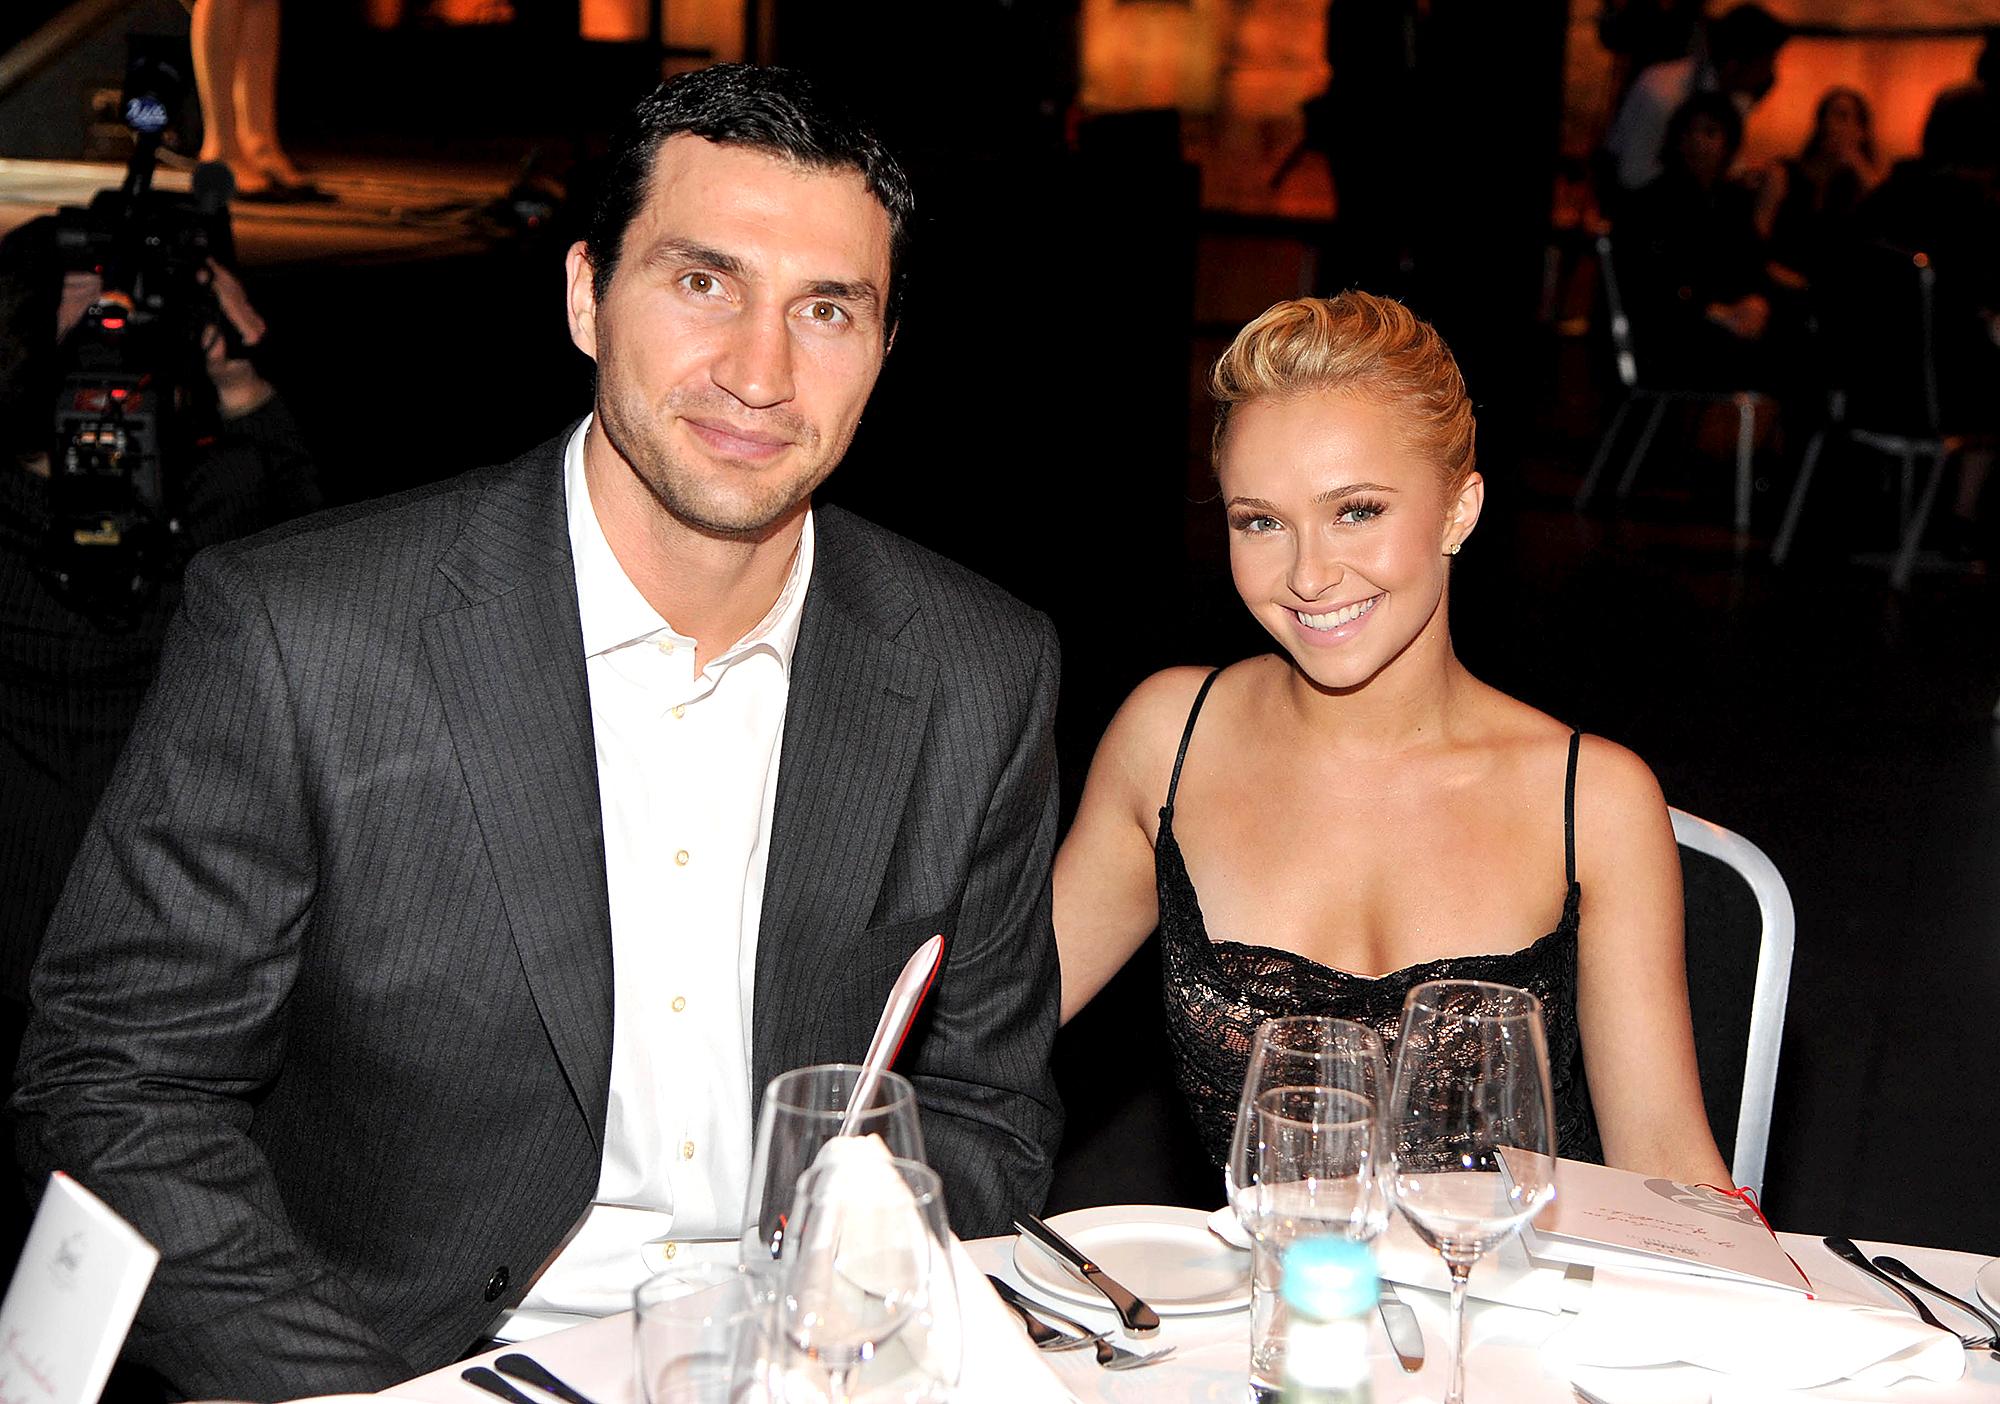 Hayden-Panettiere's-Ex-Wladimir-Klitschko-Is-'Very-Concerned'-About-Her-Relationship